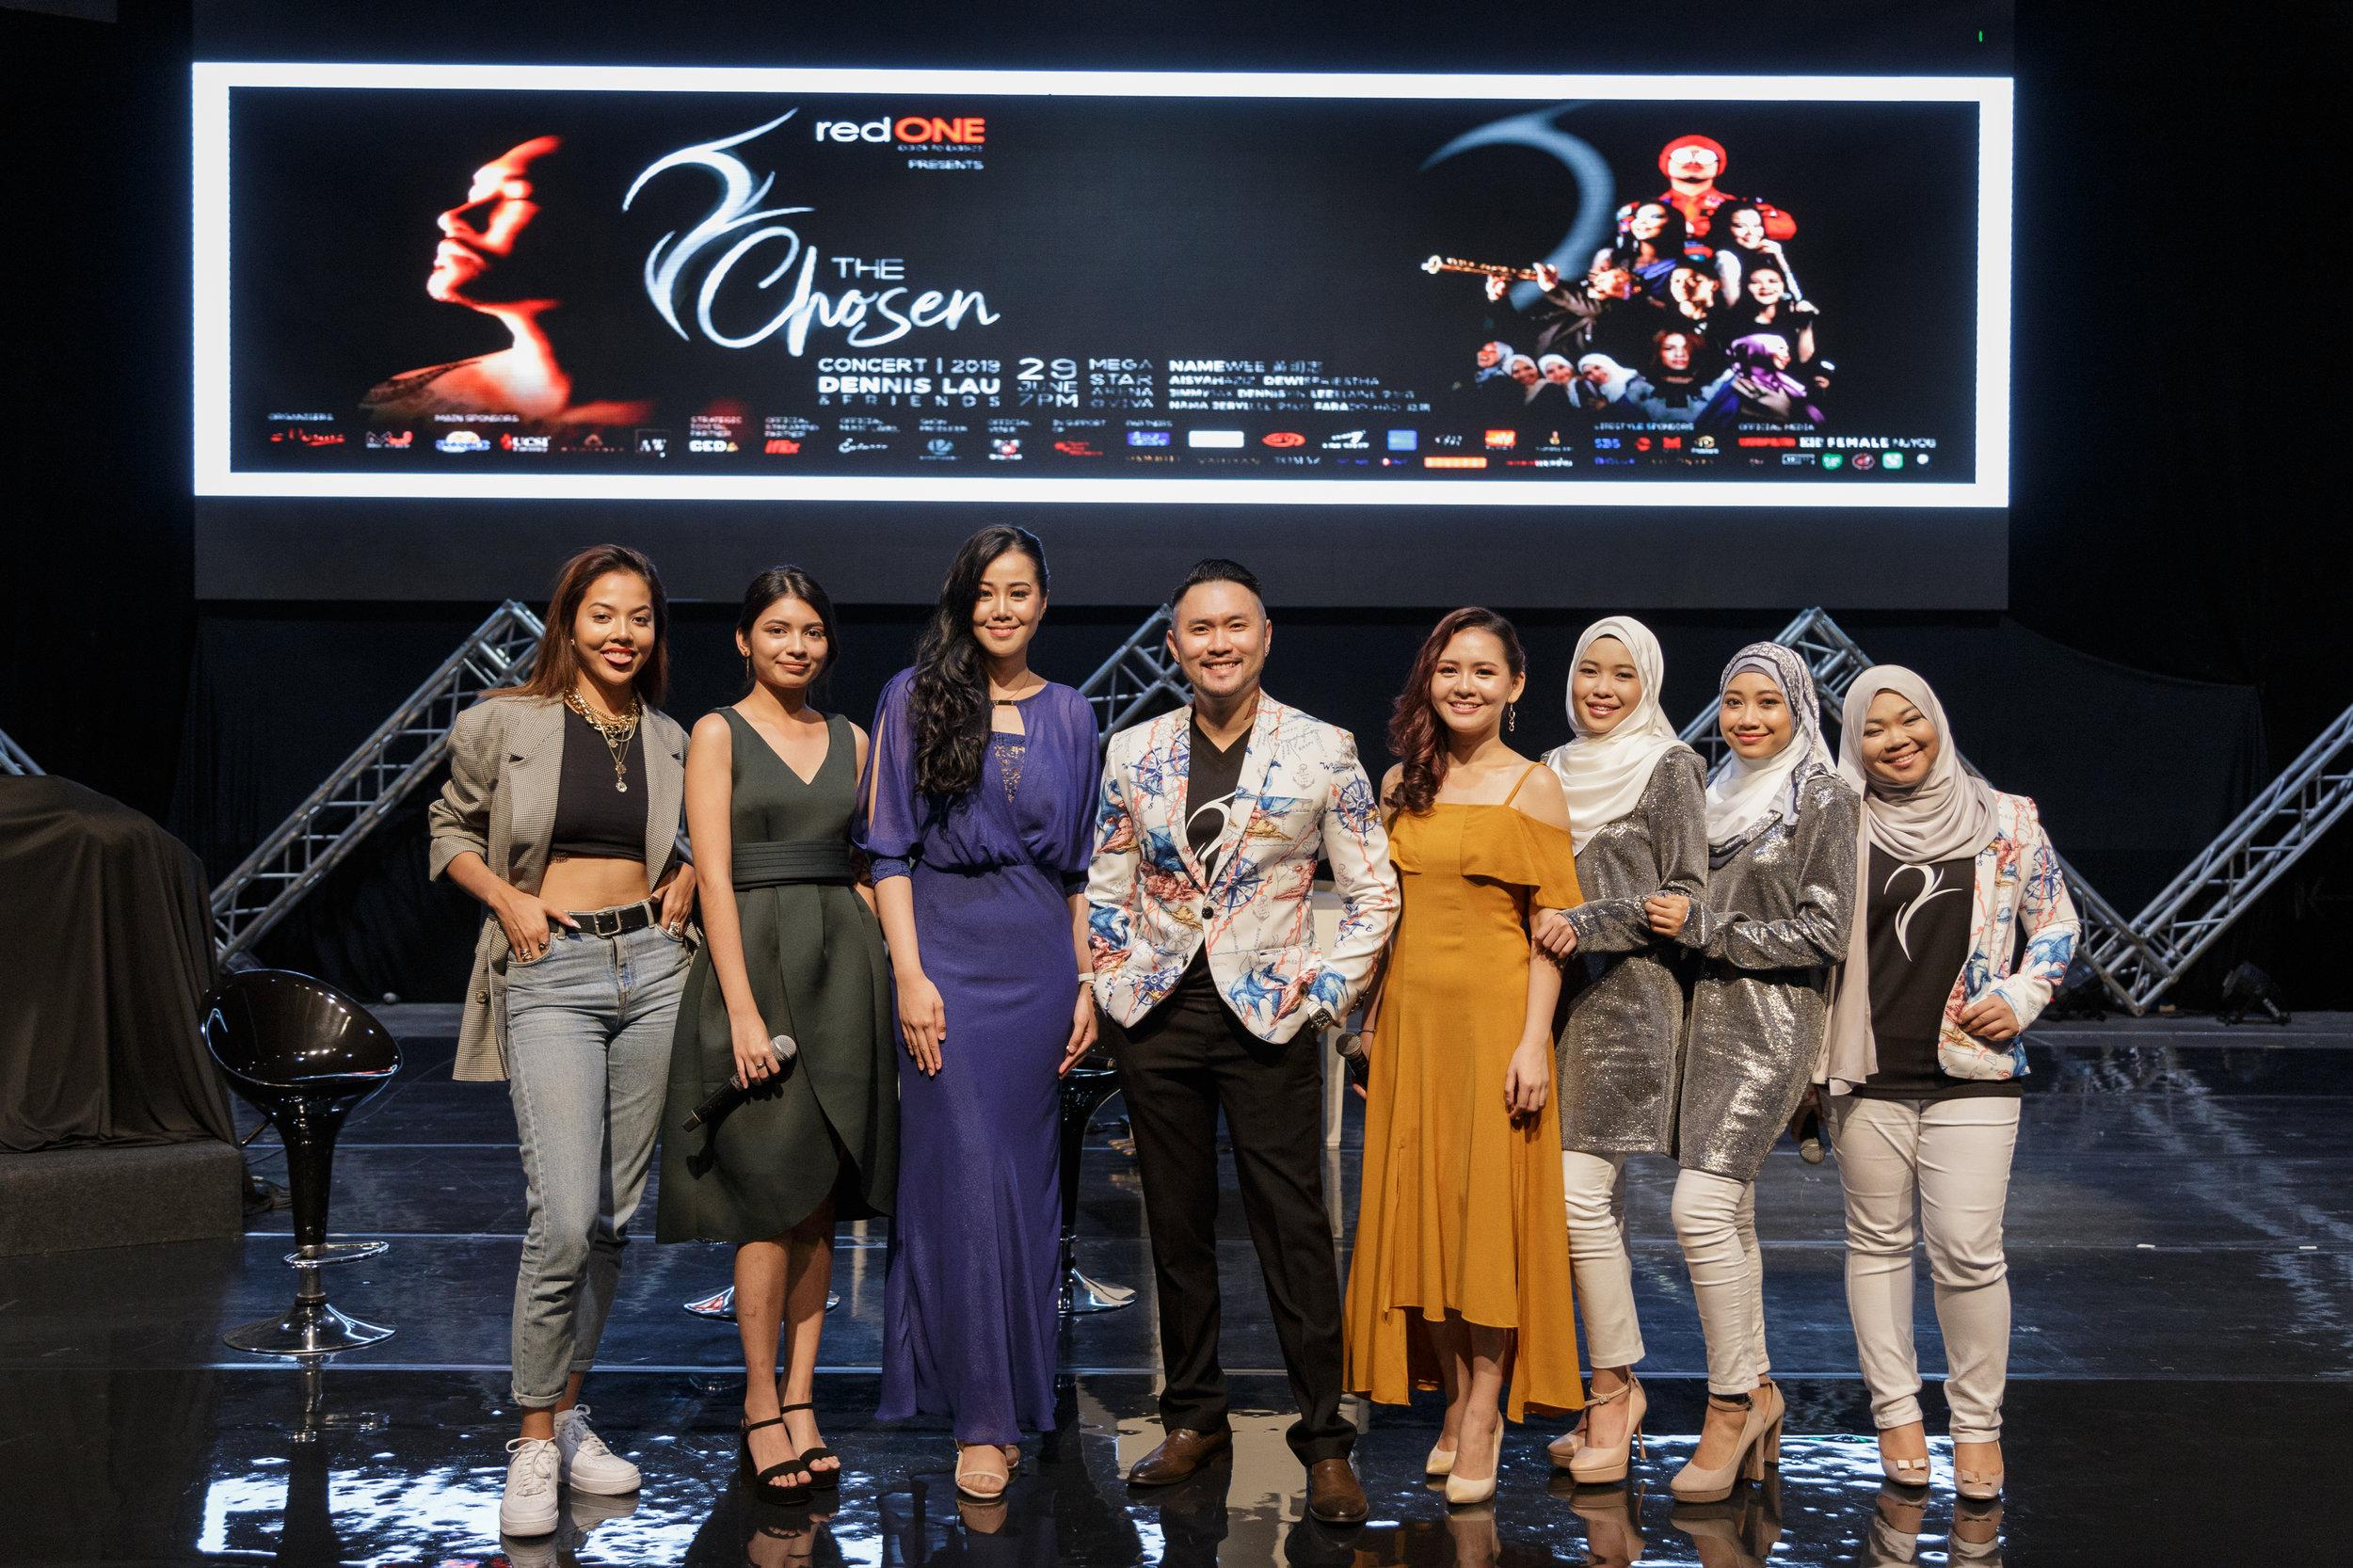 (Left to right) Aisyah Aziz, Jeryl Lee, Dewi Seriestha, Dennis Lau, Lee Elaine, NAMA and Fara Dolhadi.